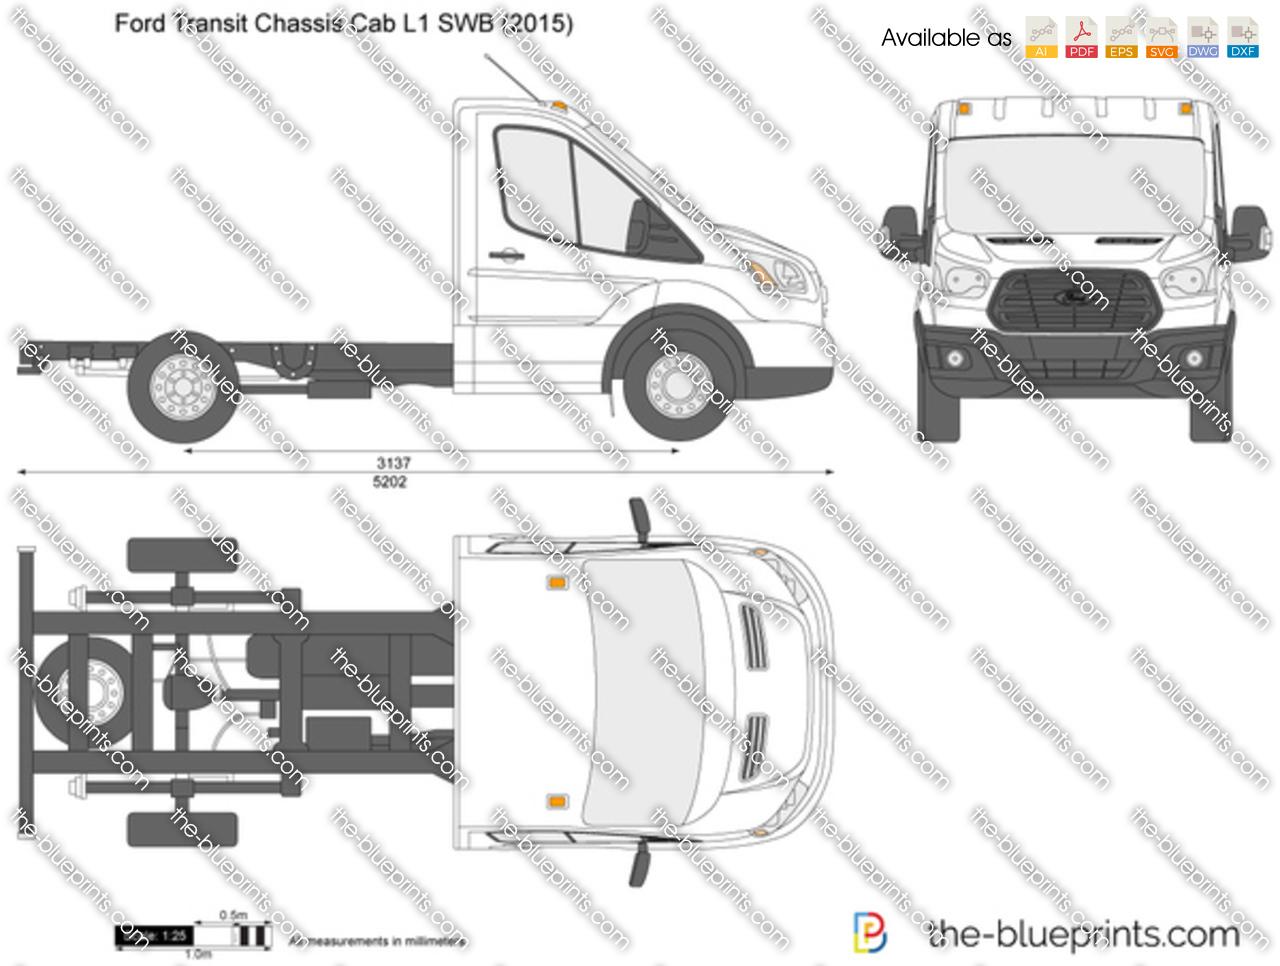 Ford Transit Chassis Cab L1 SWB 2017